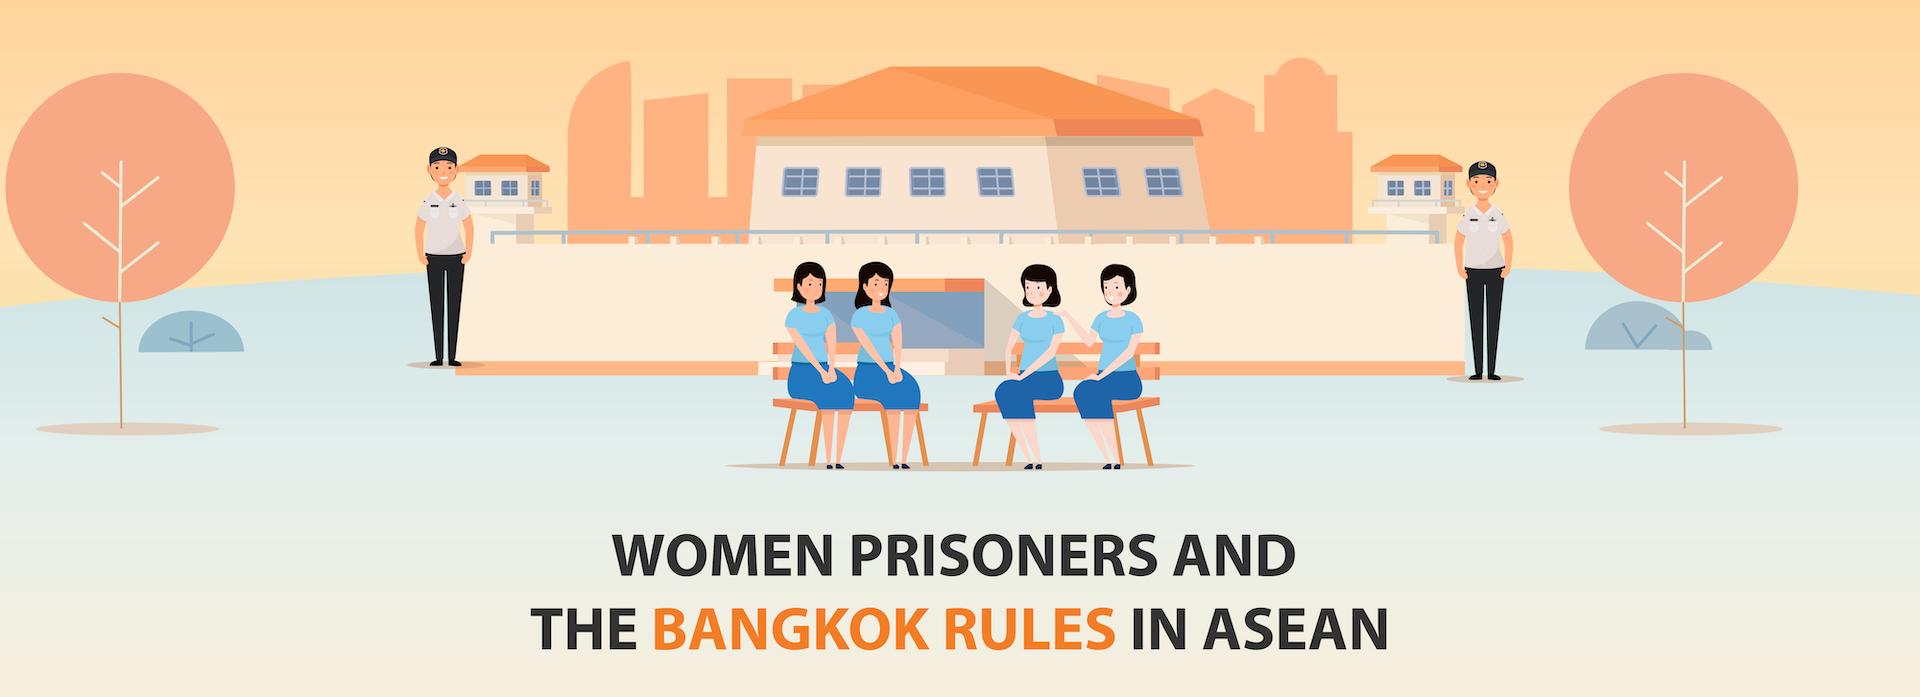 bangkok rules